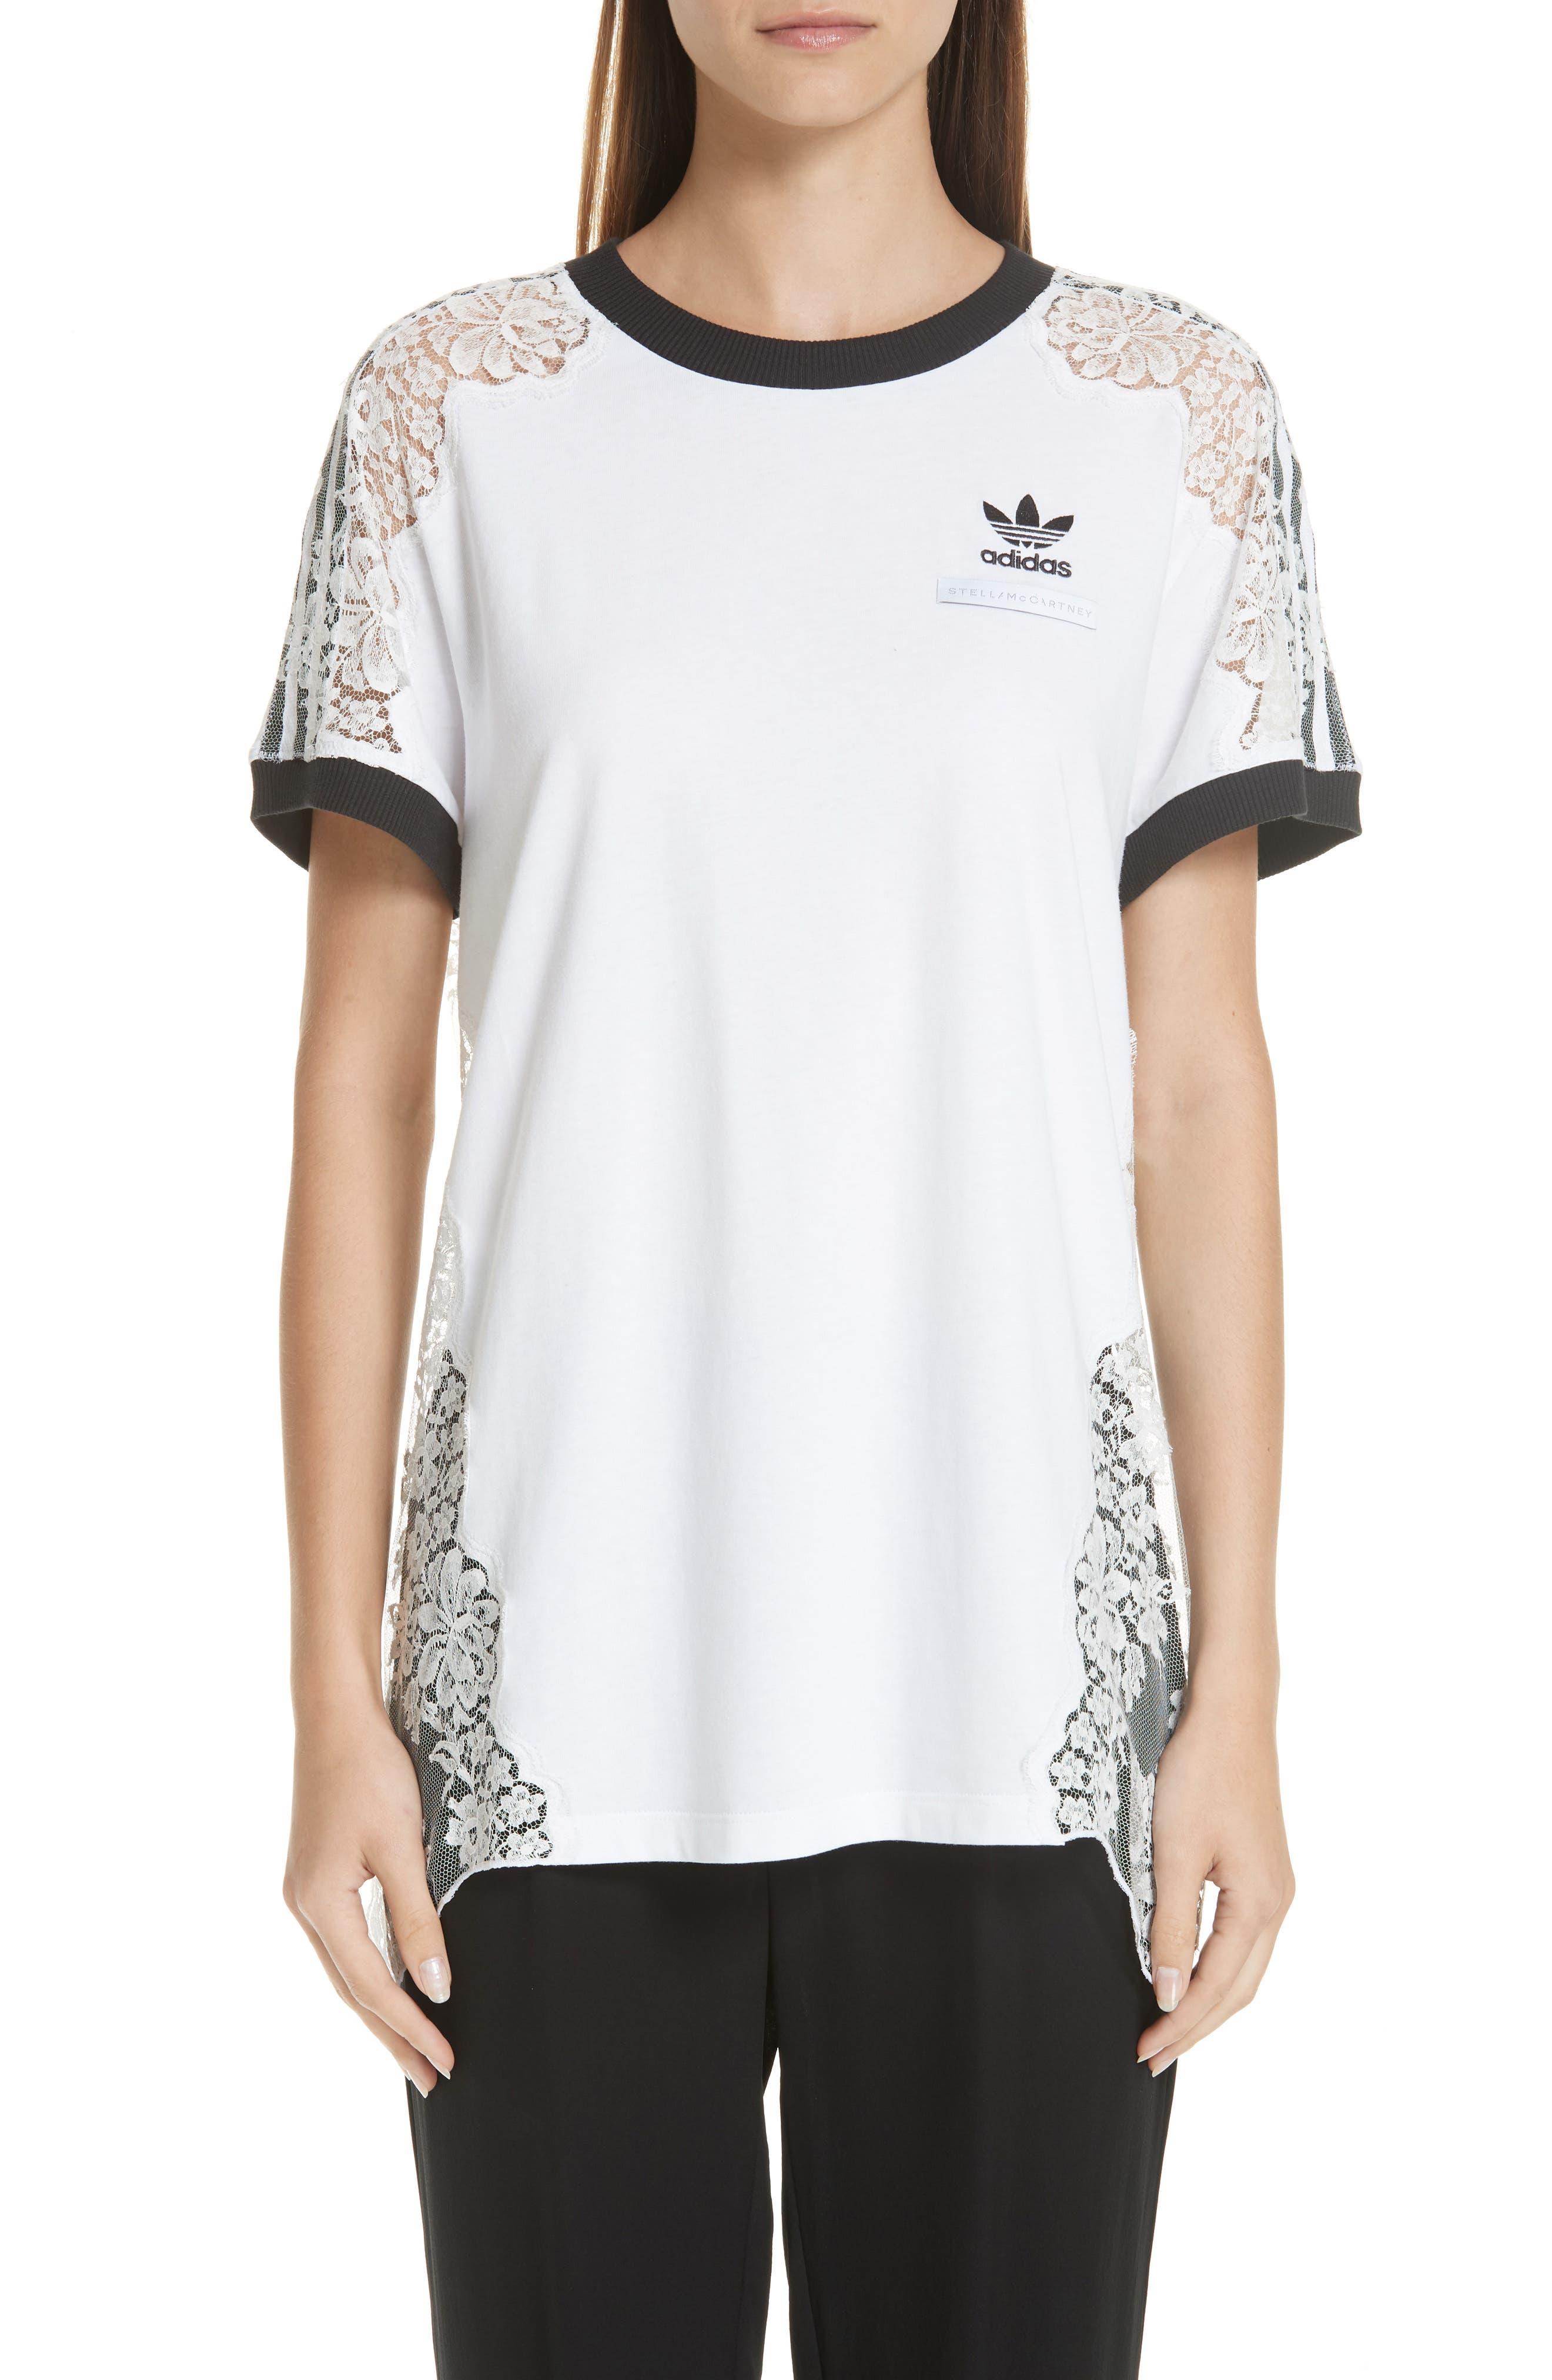 Stella Mccartney Lace Inset Adidas Logo Tee, White